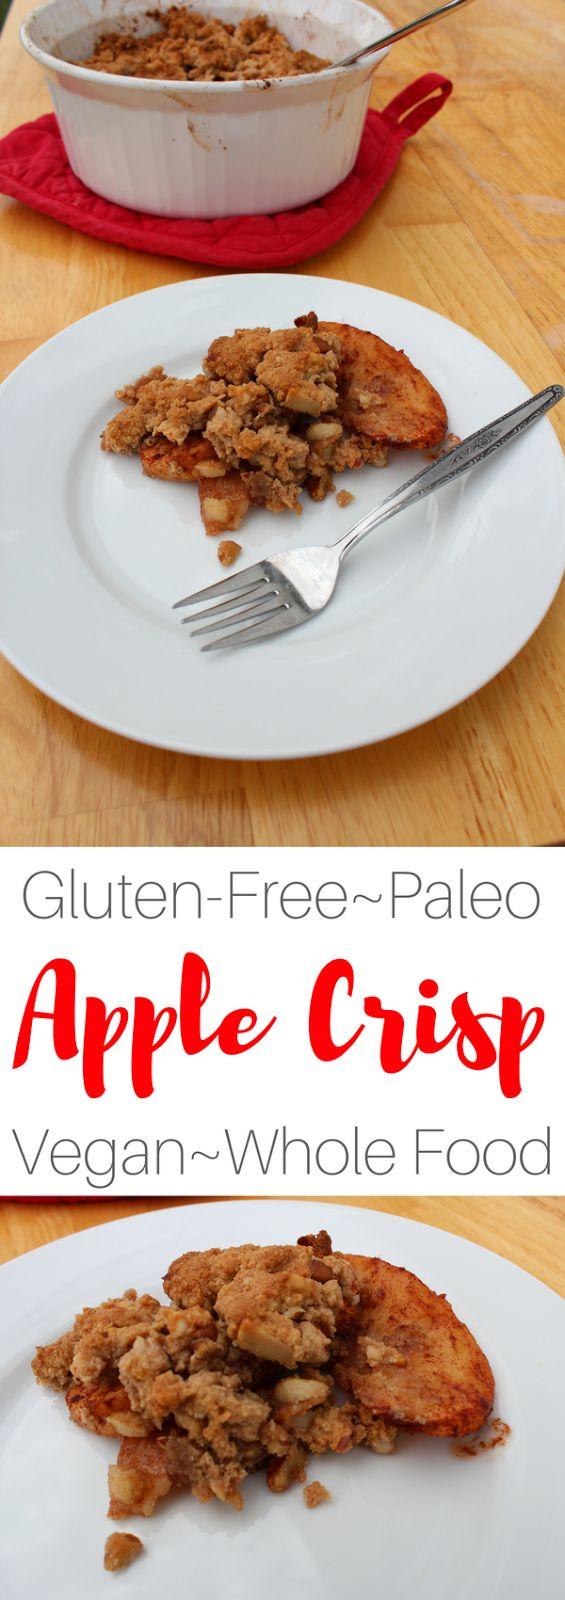 Easy Paleo Apple Crisp Recipe